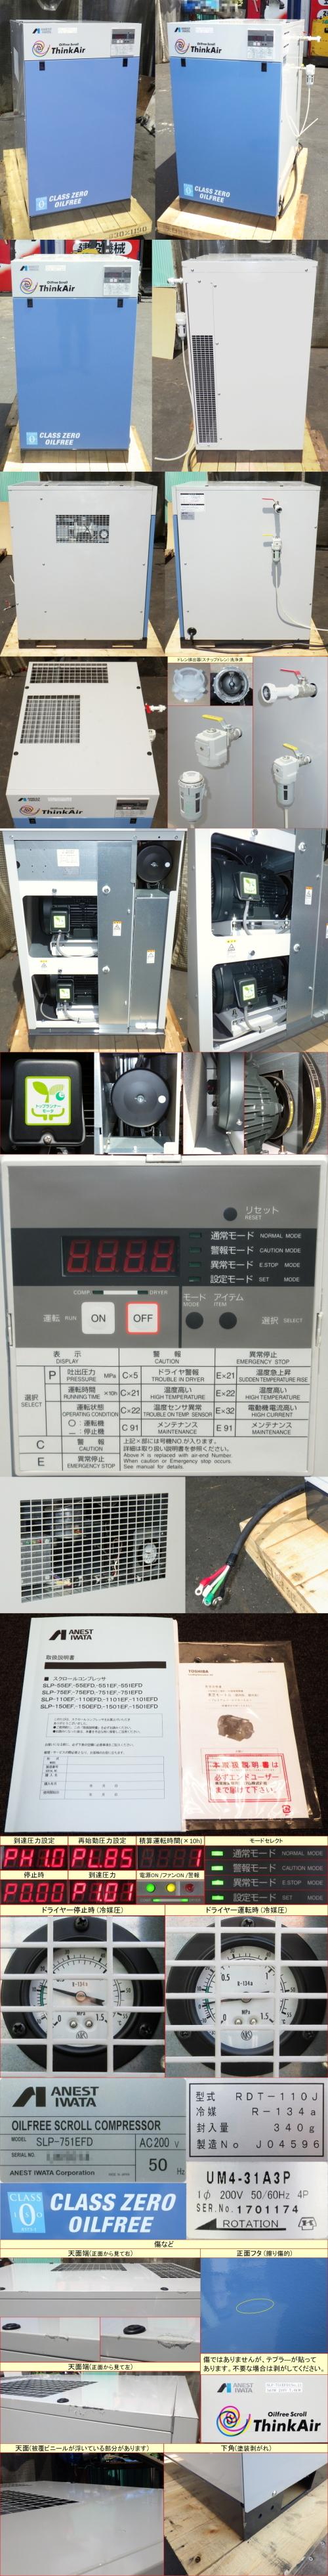 RIMG 4949X